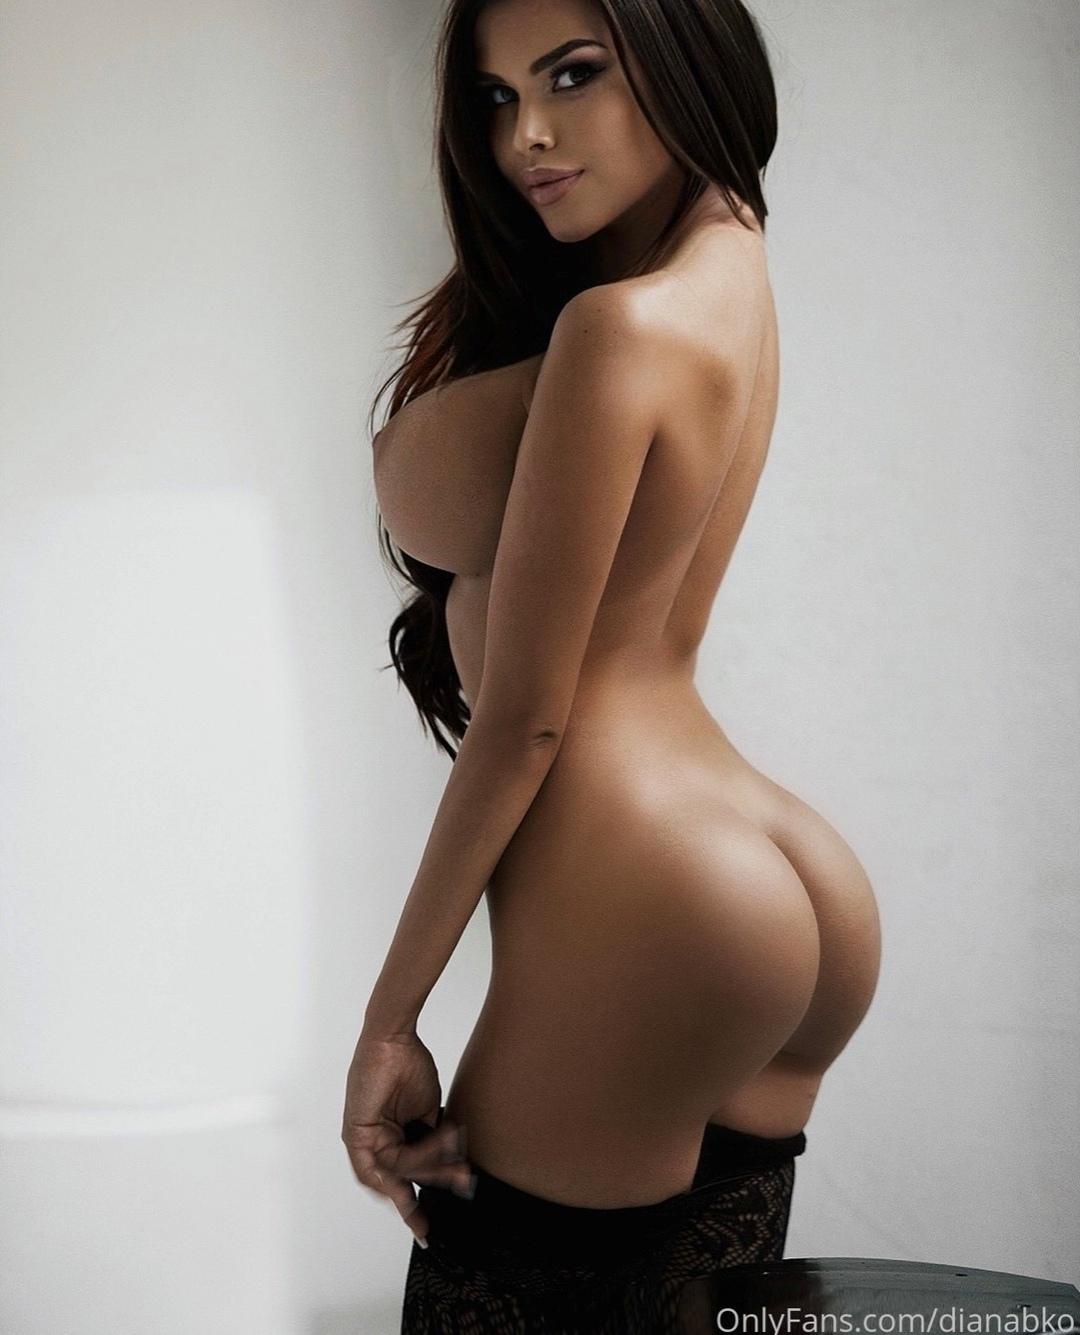 Diana Bako Dianabko Onlyfans Nudes Leaks 0036